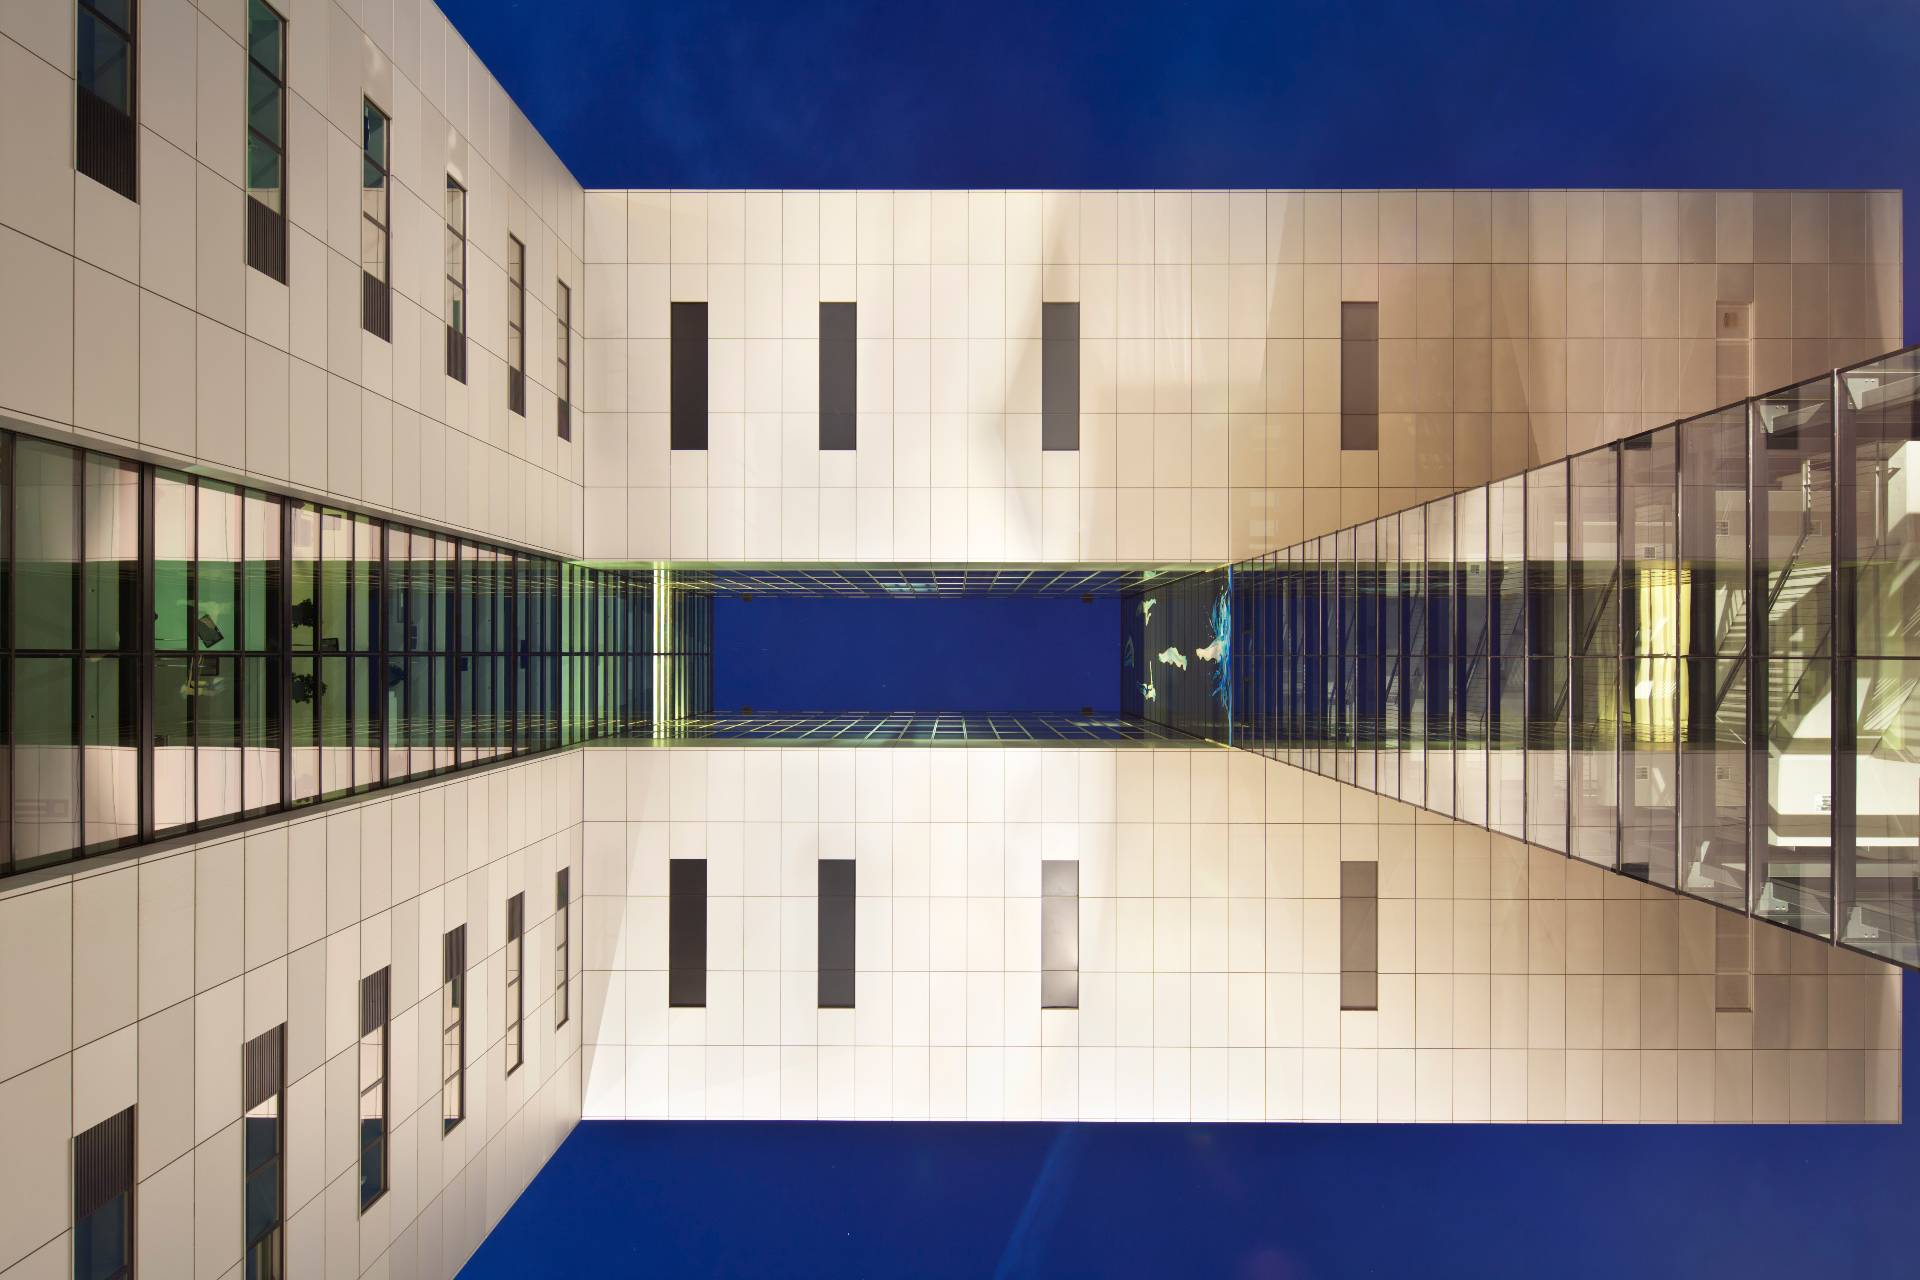 Adolf Loos, el padre de la arquitectura moderna - Historia del diseño